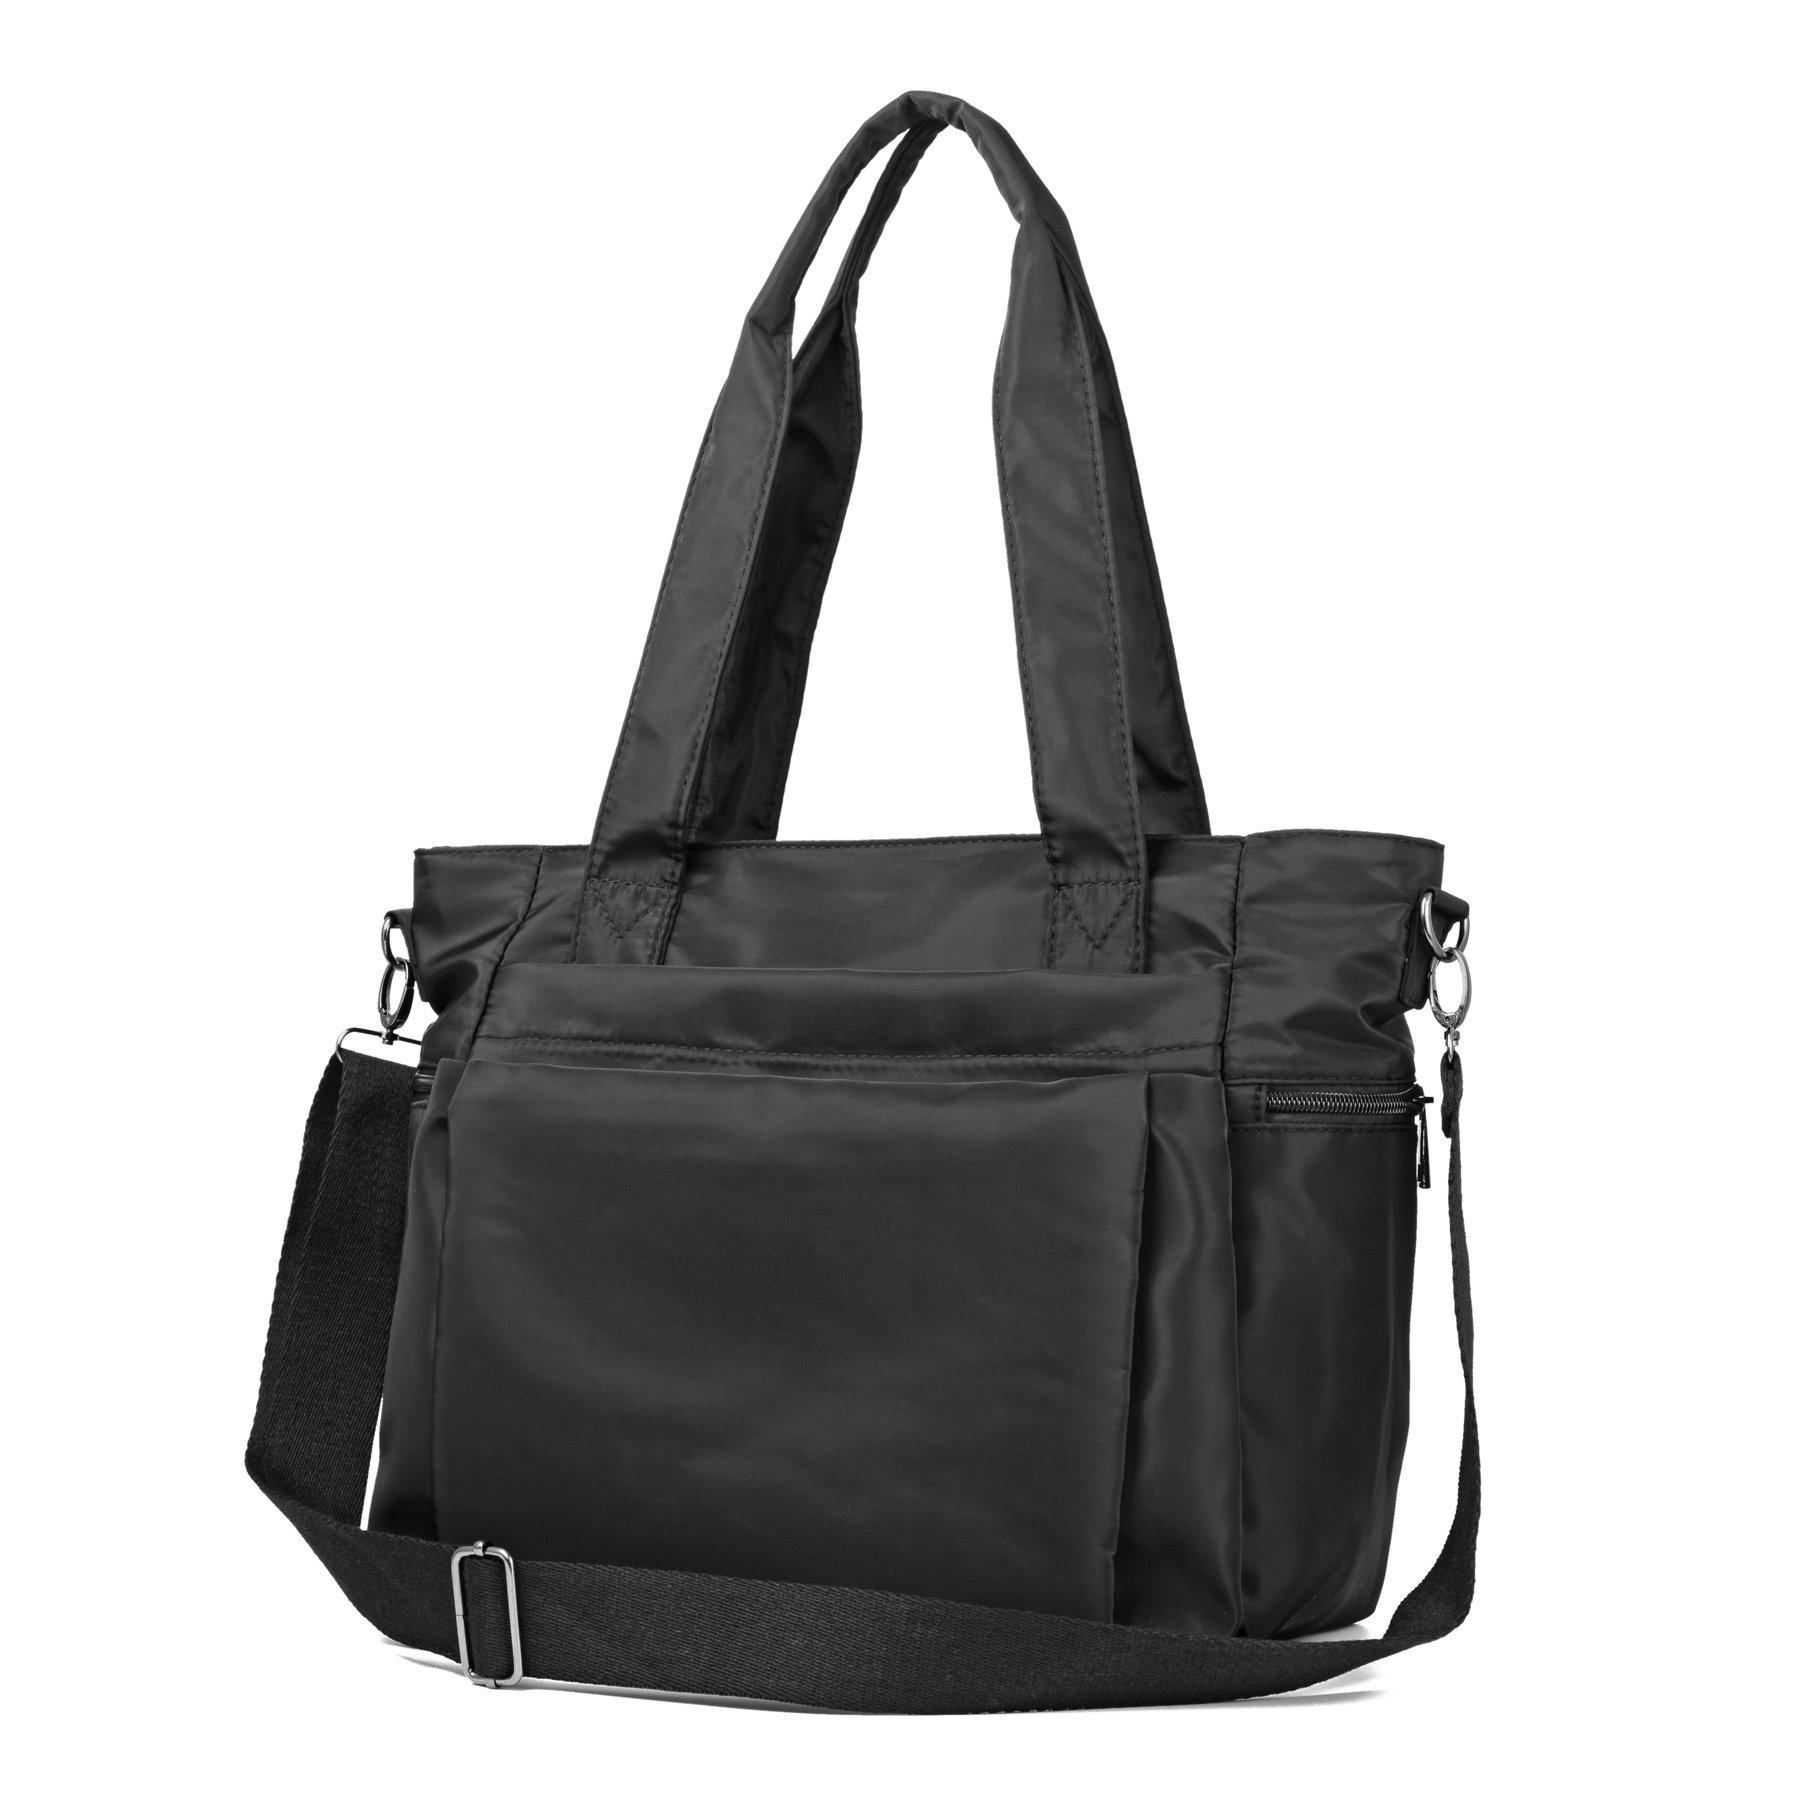 ZORESS Women Fashion Large Tote Shoulder Handbag Waterproof Multi-function Nylon Travel Messenger Bags (Black)